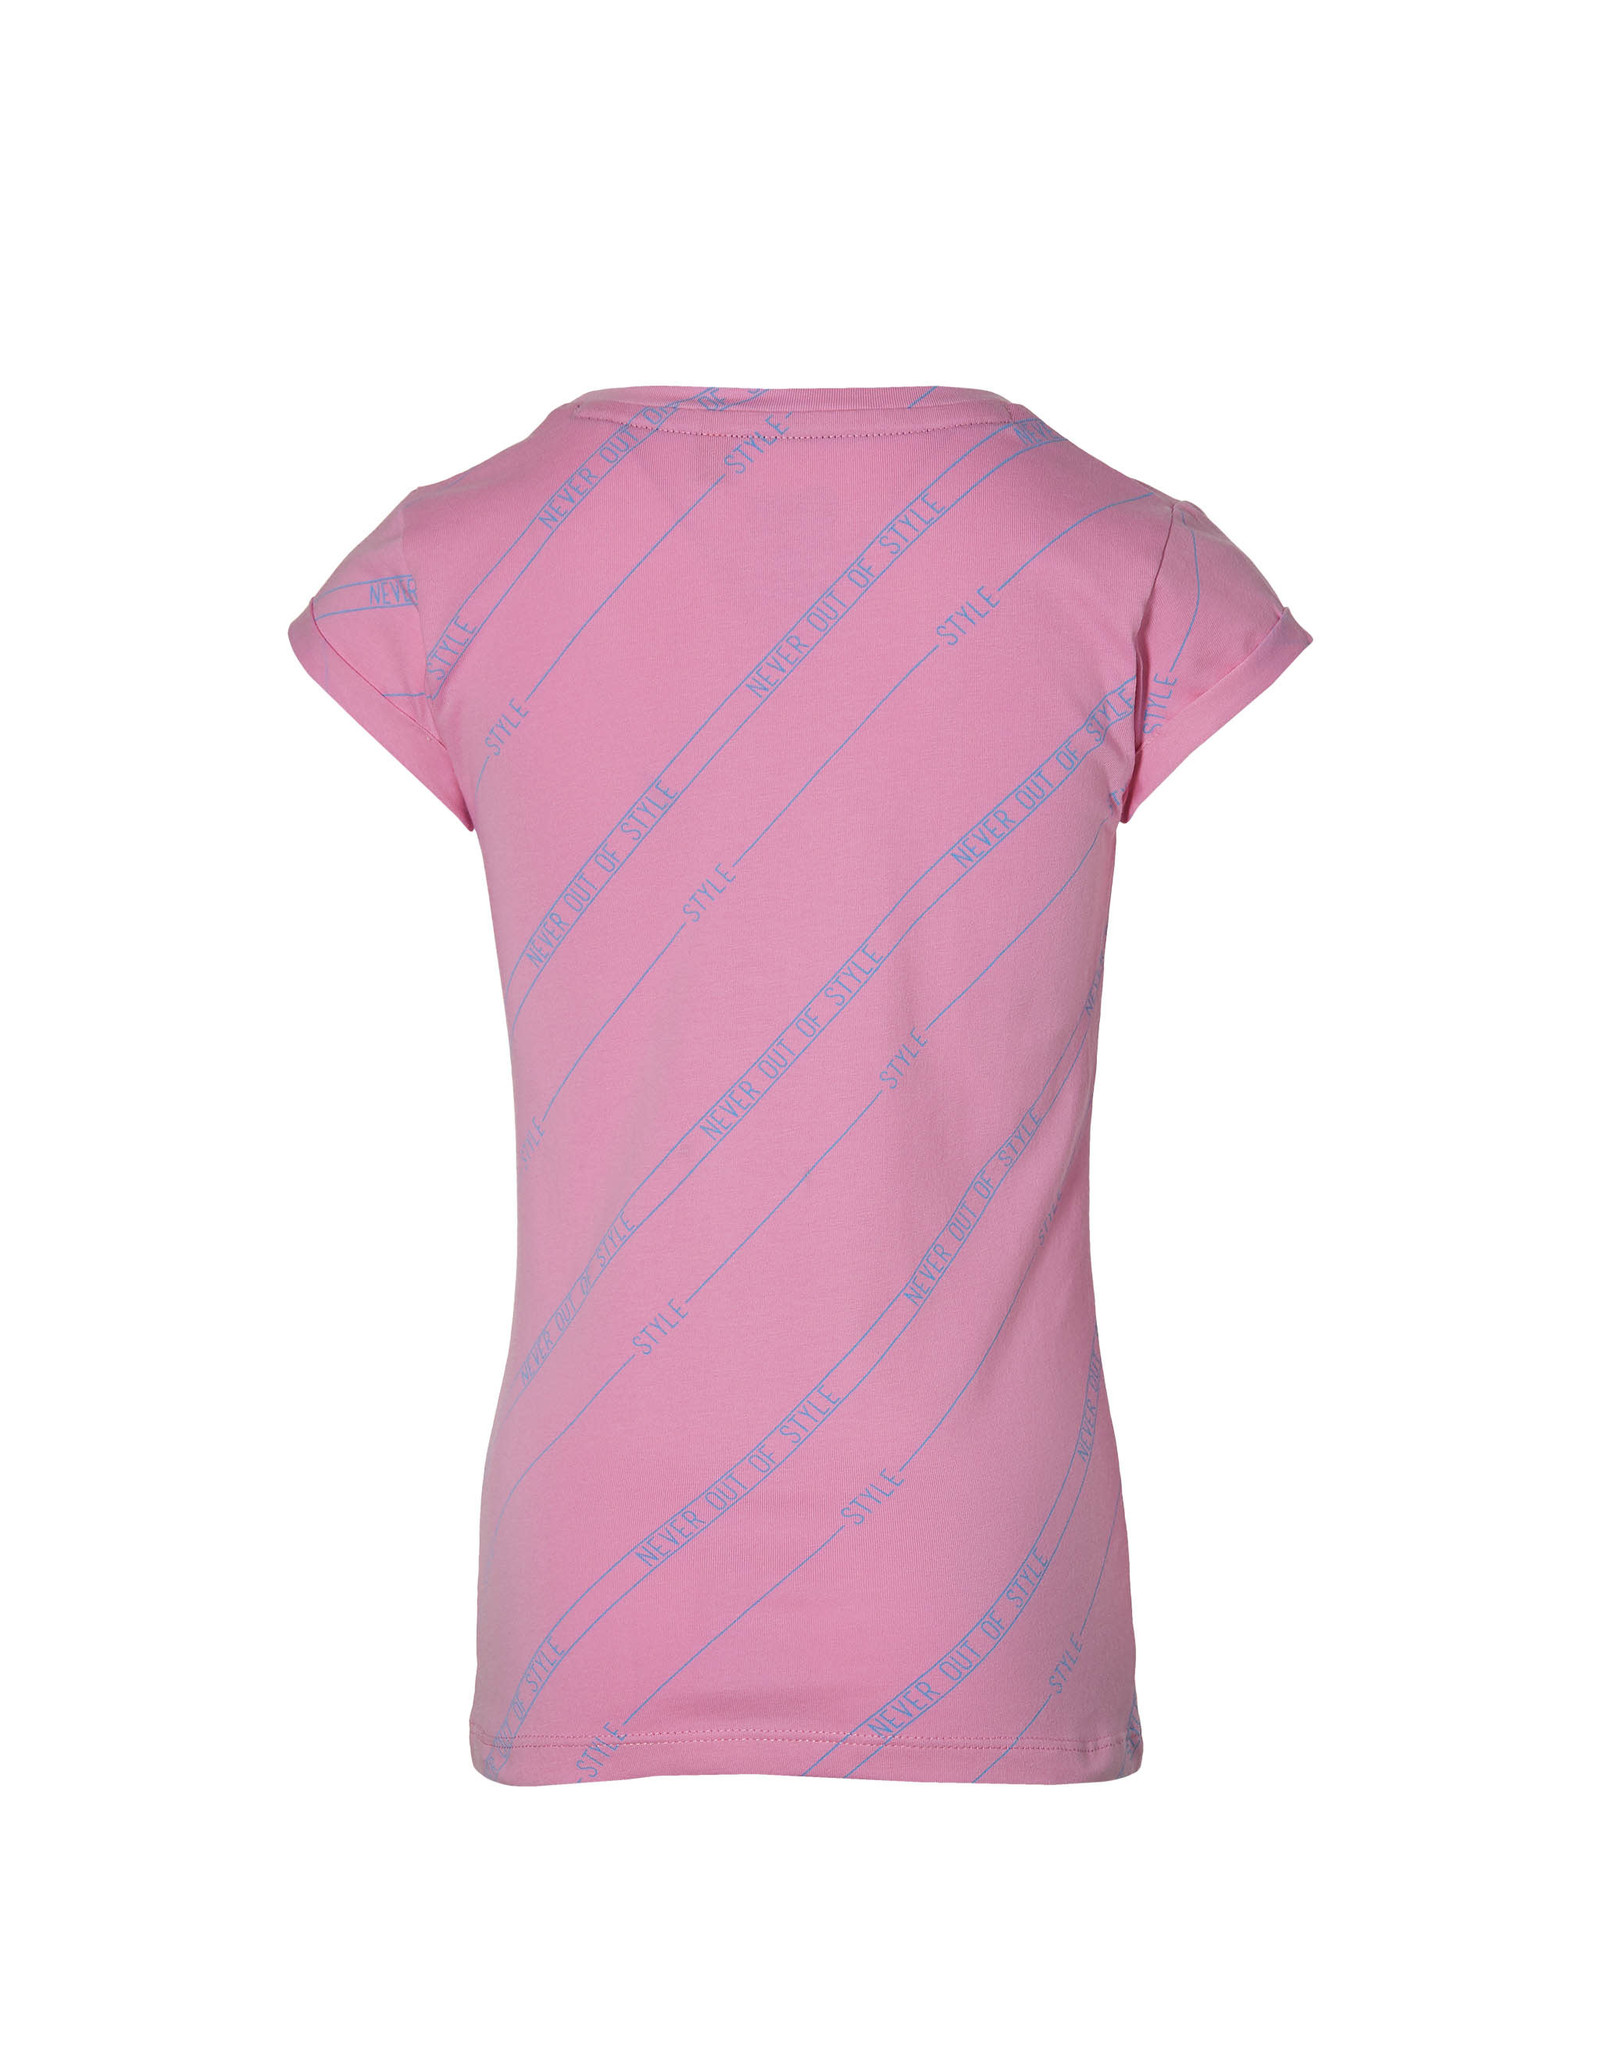 Quapi Quapi meisjes t-shirt Femma Soft Pink